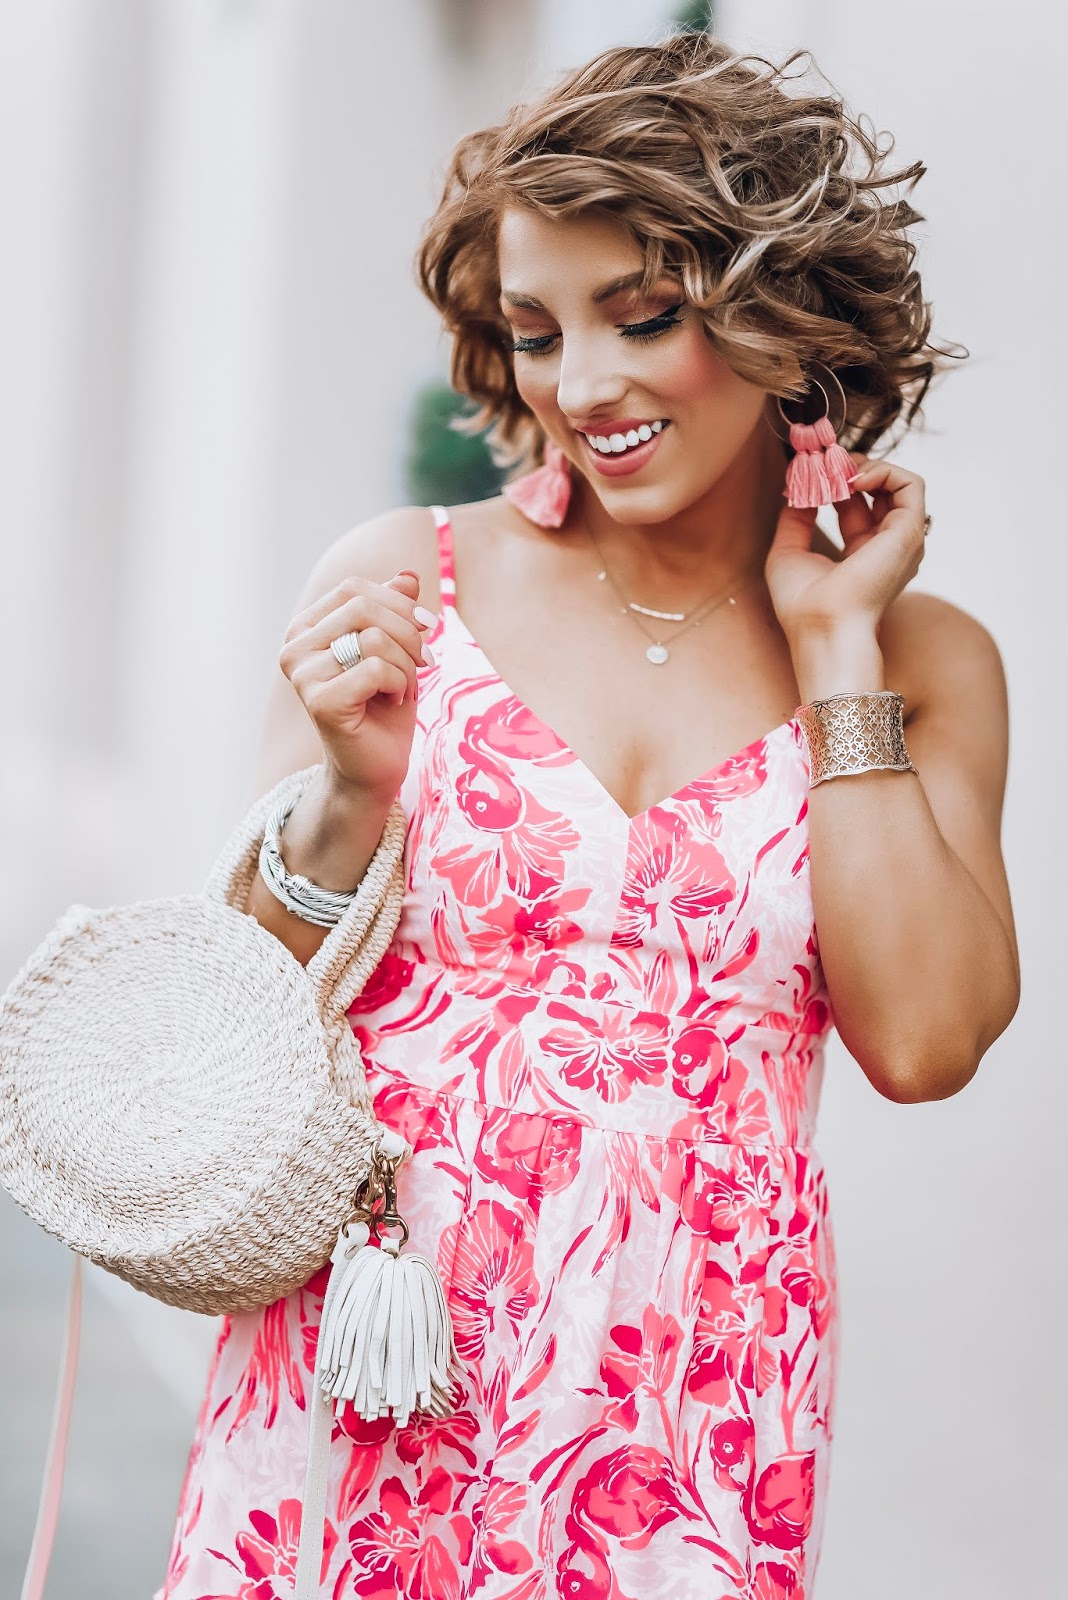 Lilly Pulitzer Melody Maxi Dress in Charleston, SC. - Something Delightful Blog